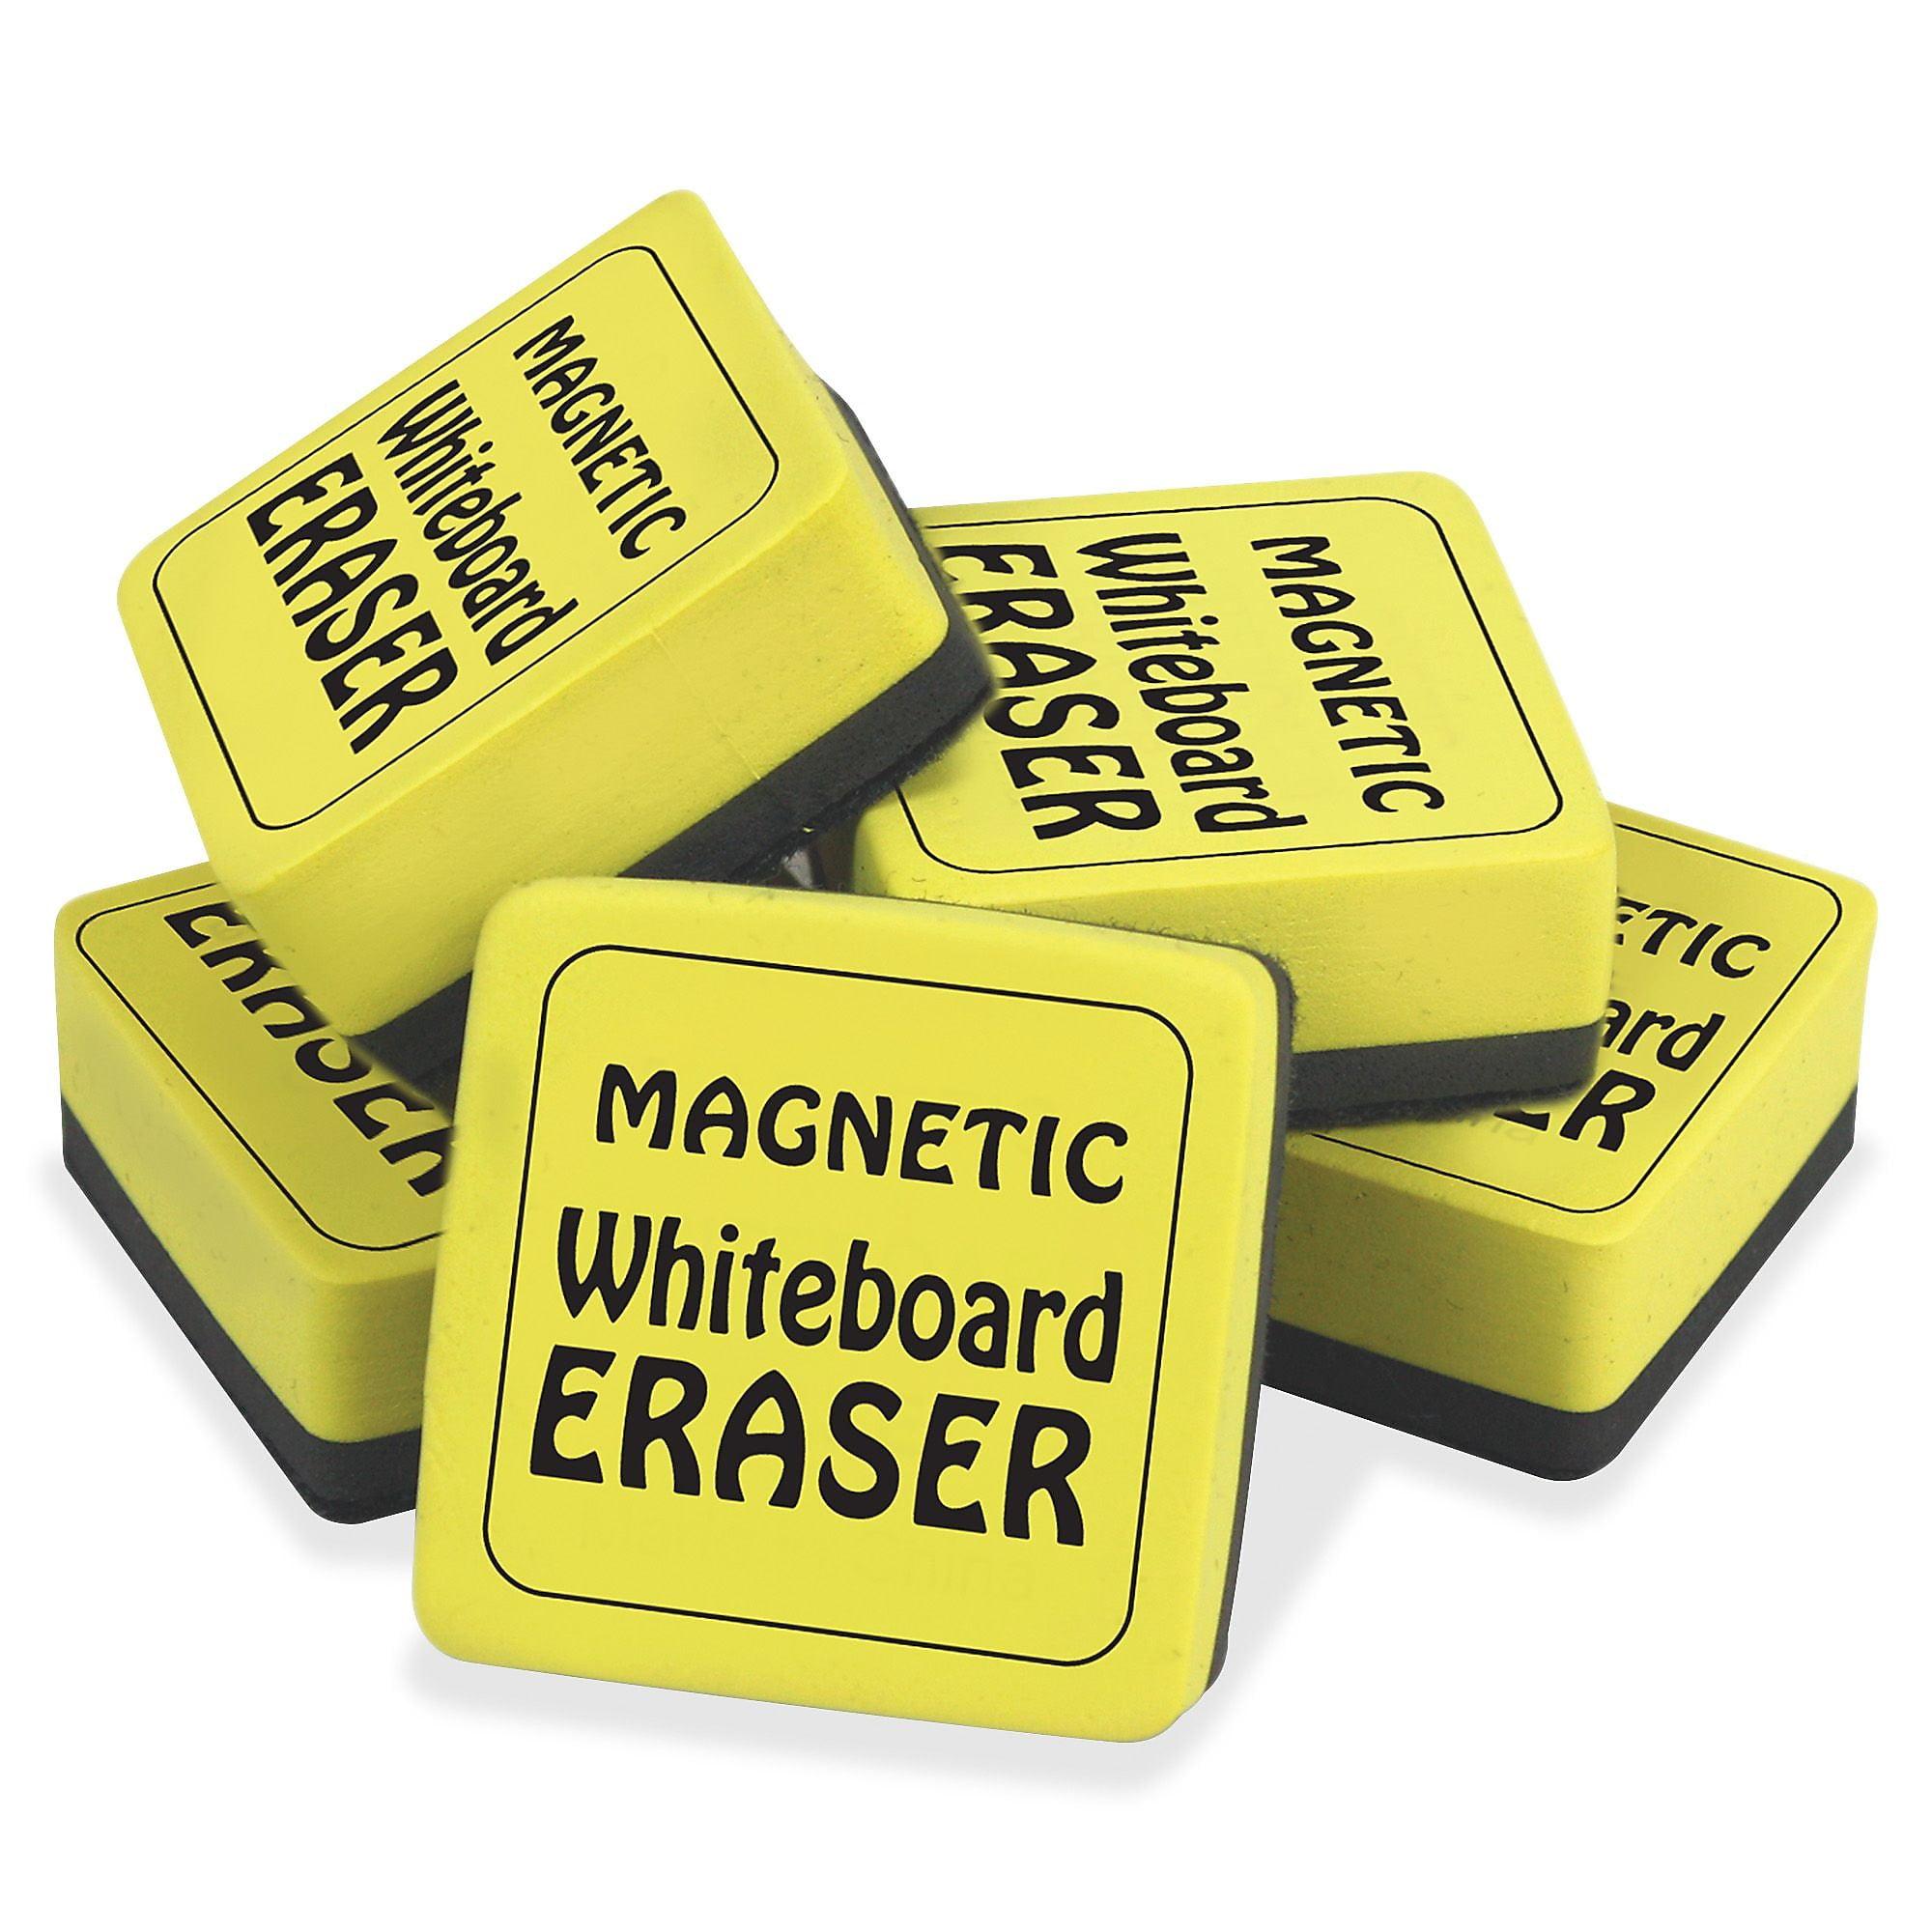 School Smart Mini Magnetic Dry Erase Board Erasers 2 X 2 12 Count Walmart Com Walmart Com